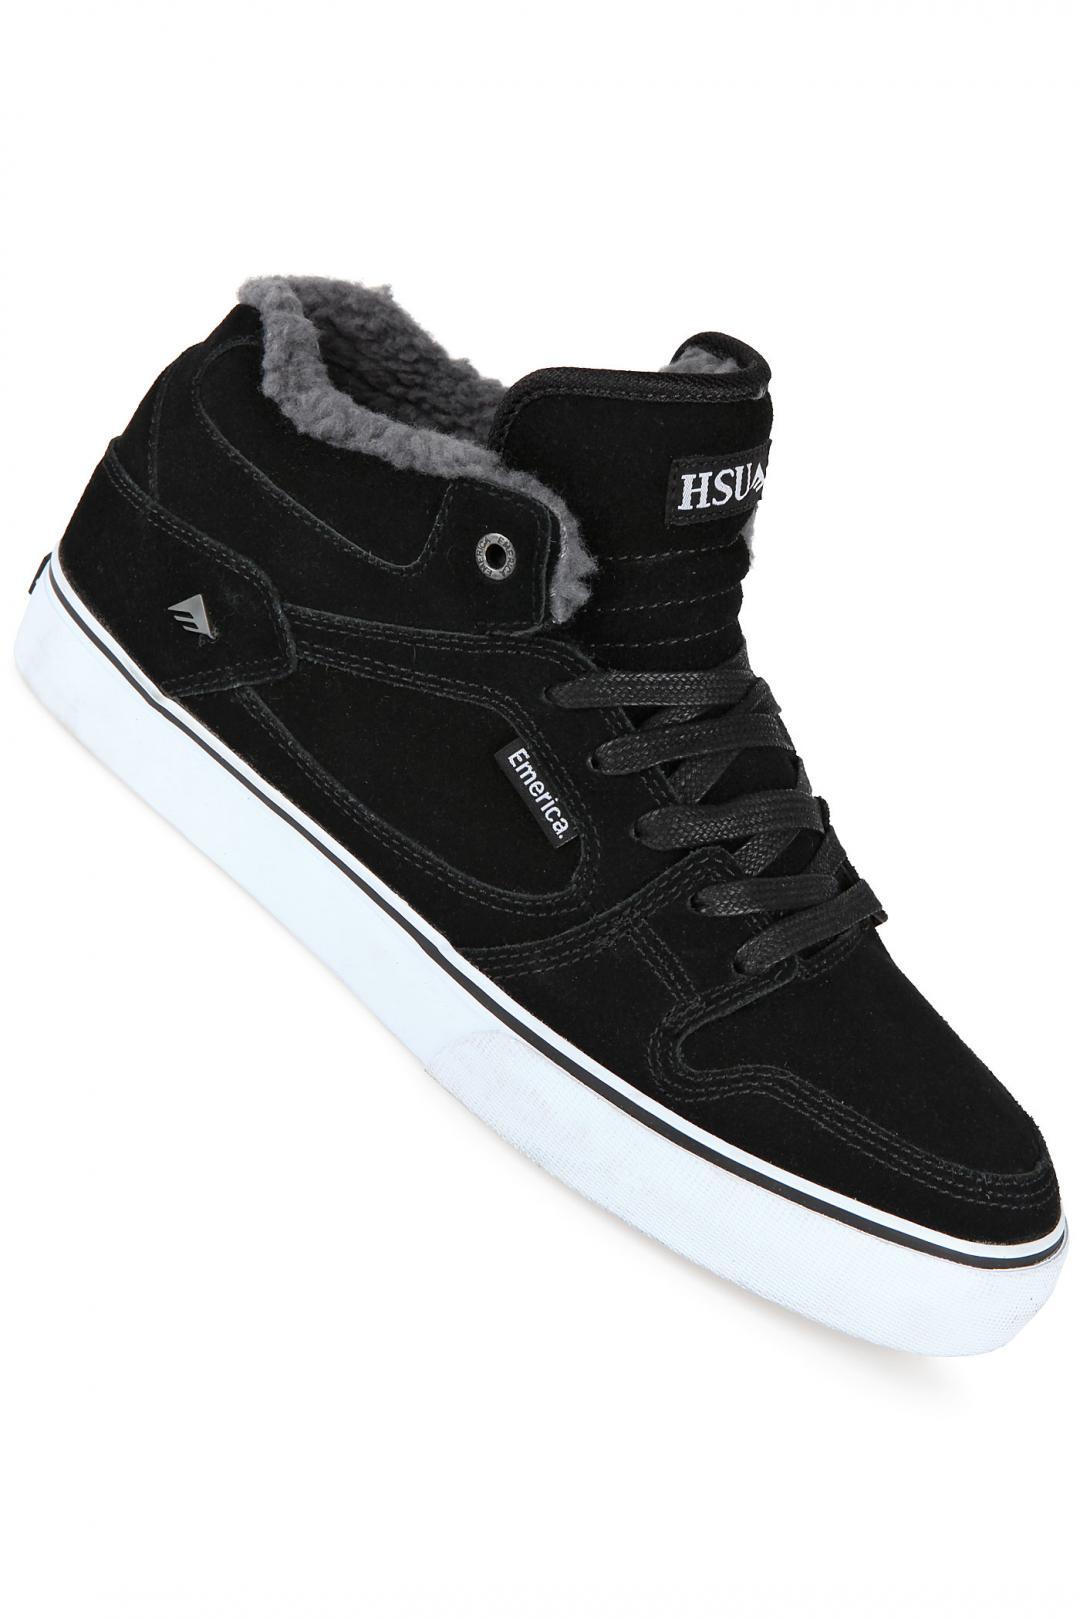 Uomo Emerica HSU SMU black dark grey | Scarpe da skate